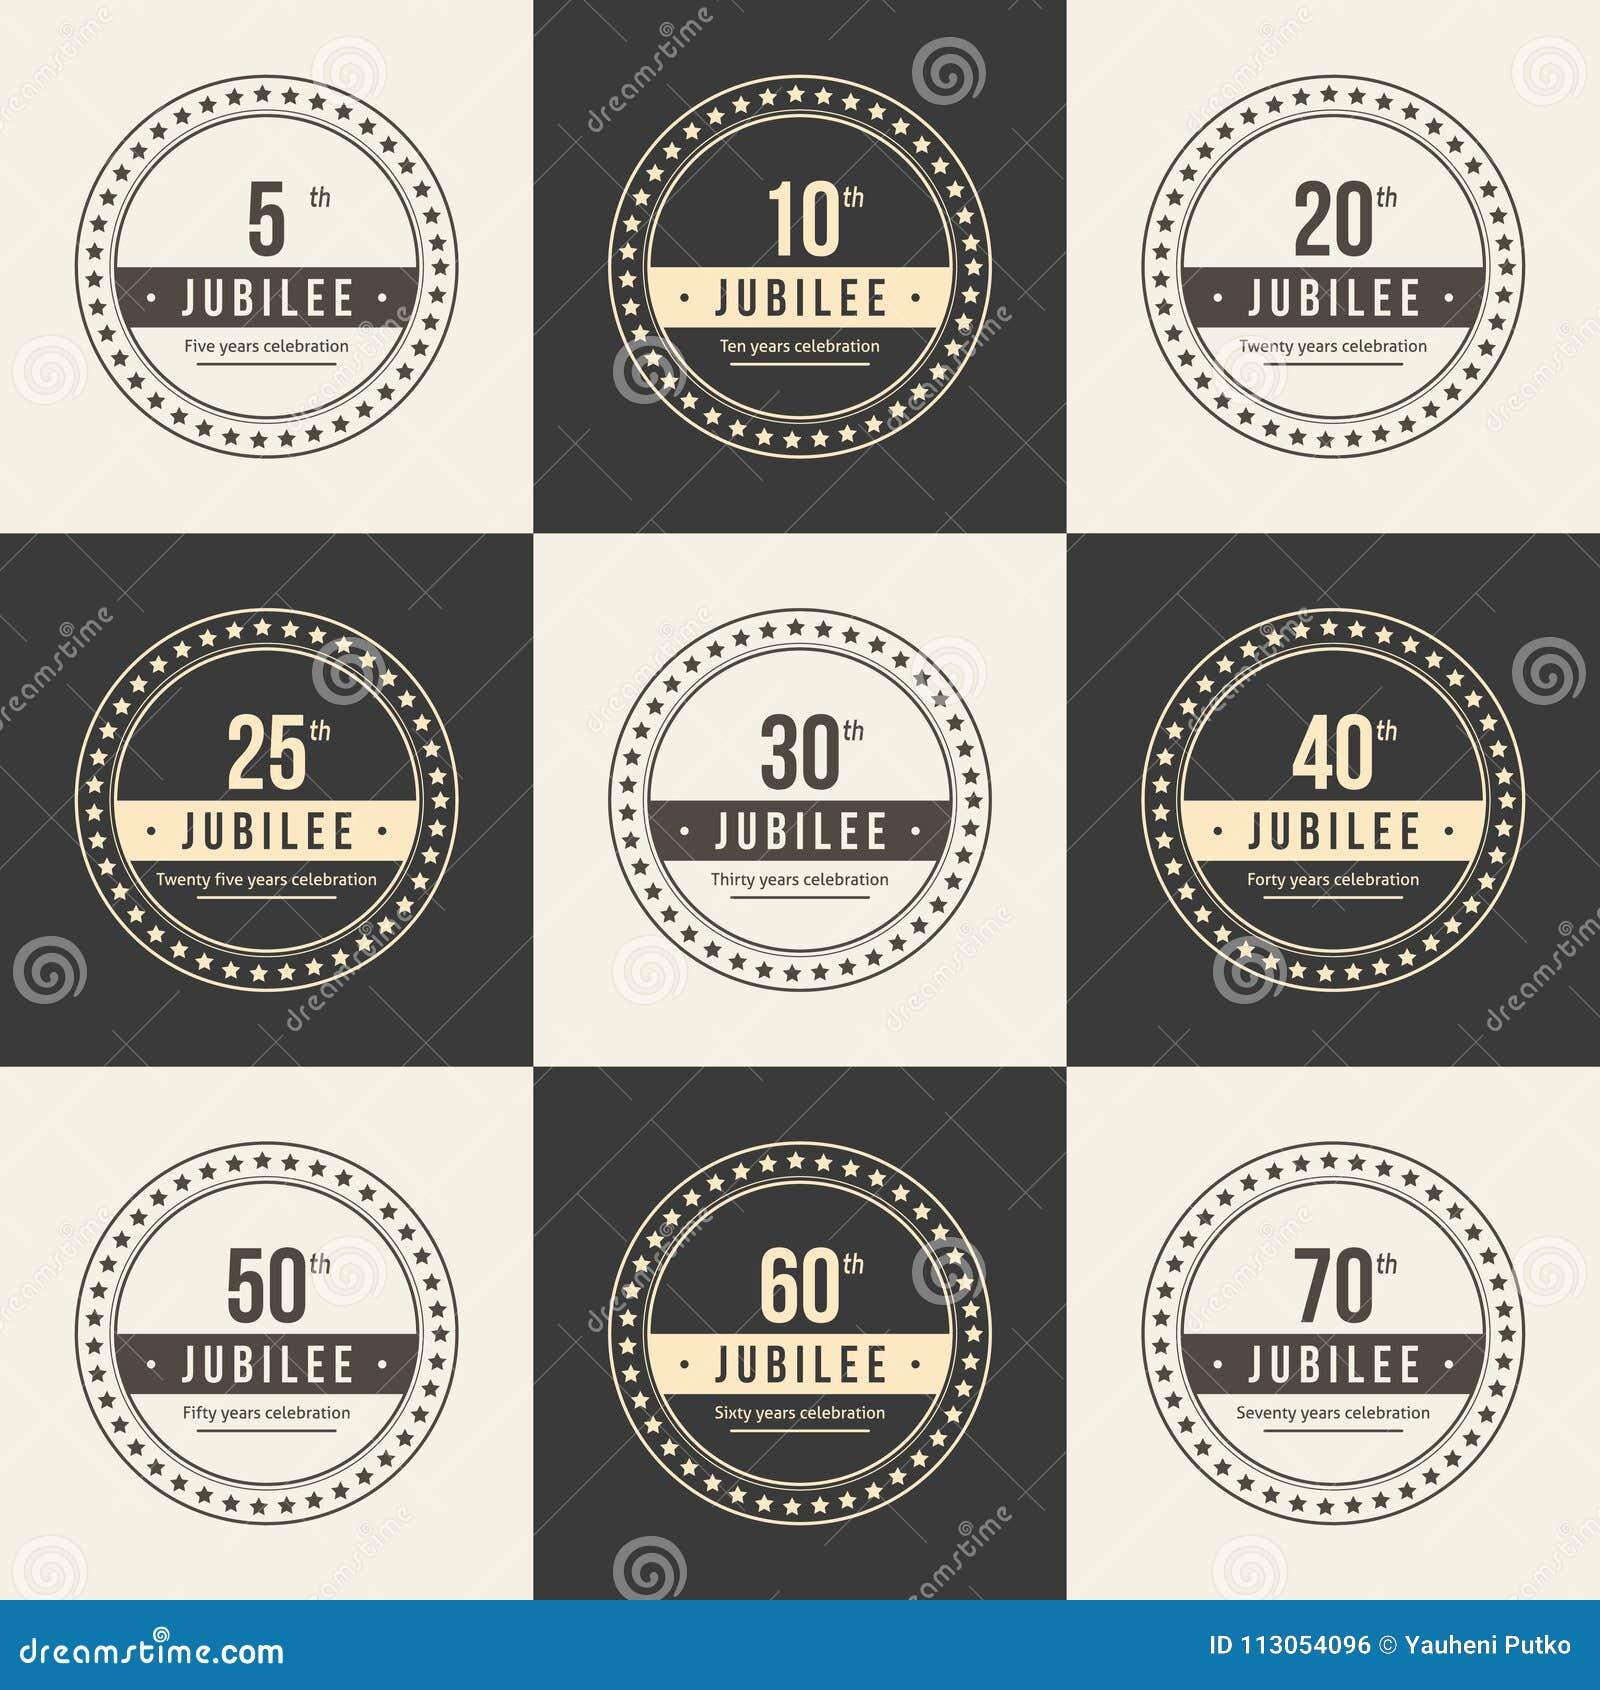 Vector Set Of Anniversary Symbols 5th 10th 20th 25th 30th 40th